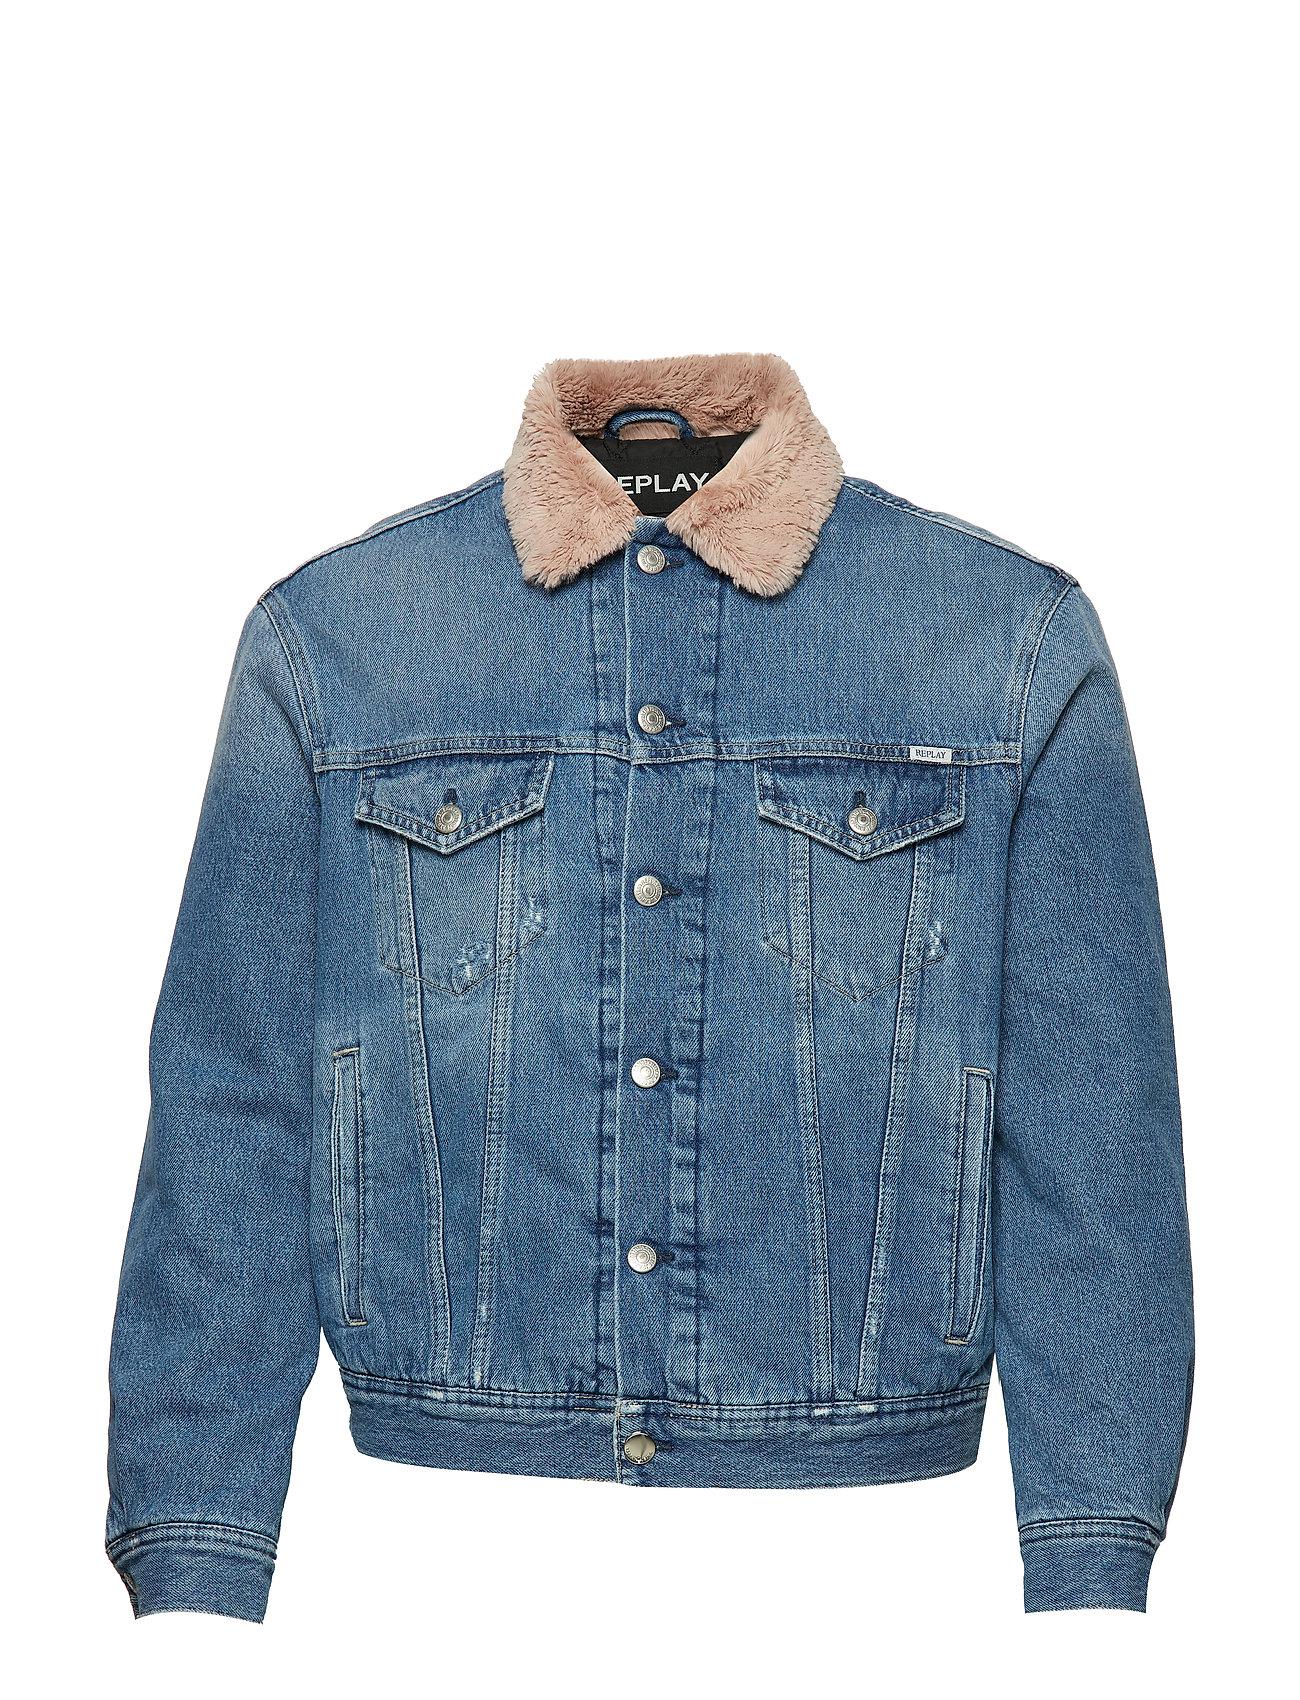 Replay Jacket - MEDIUM BLUE